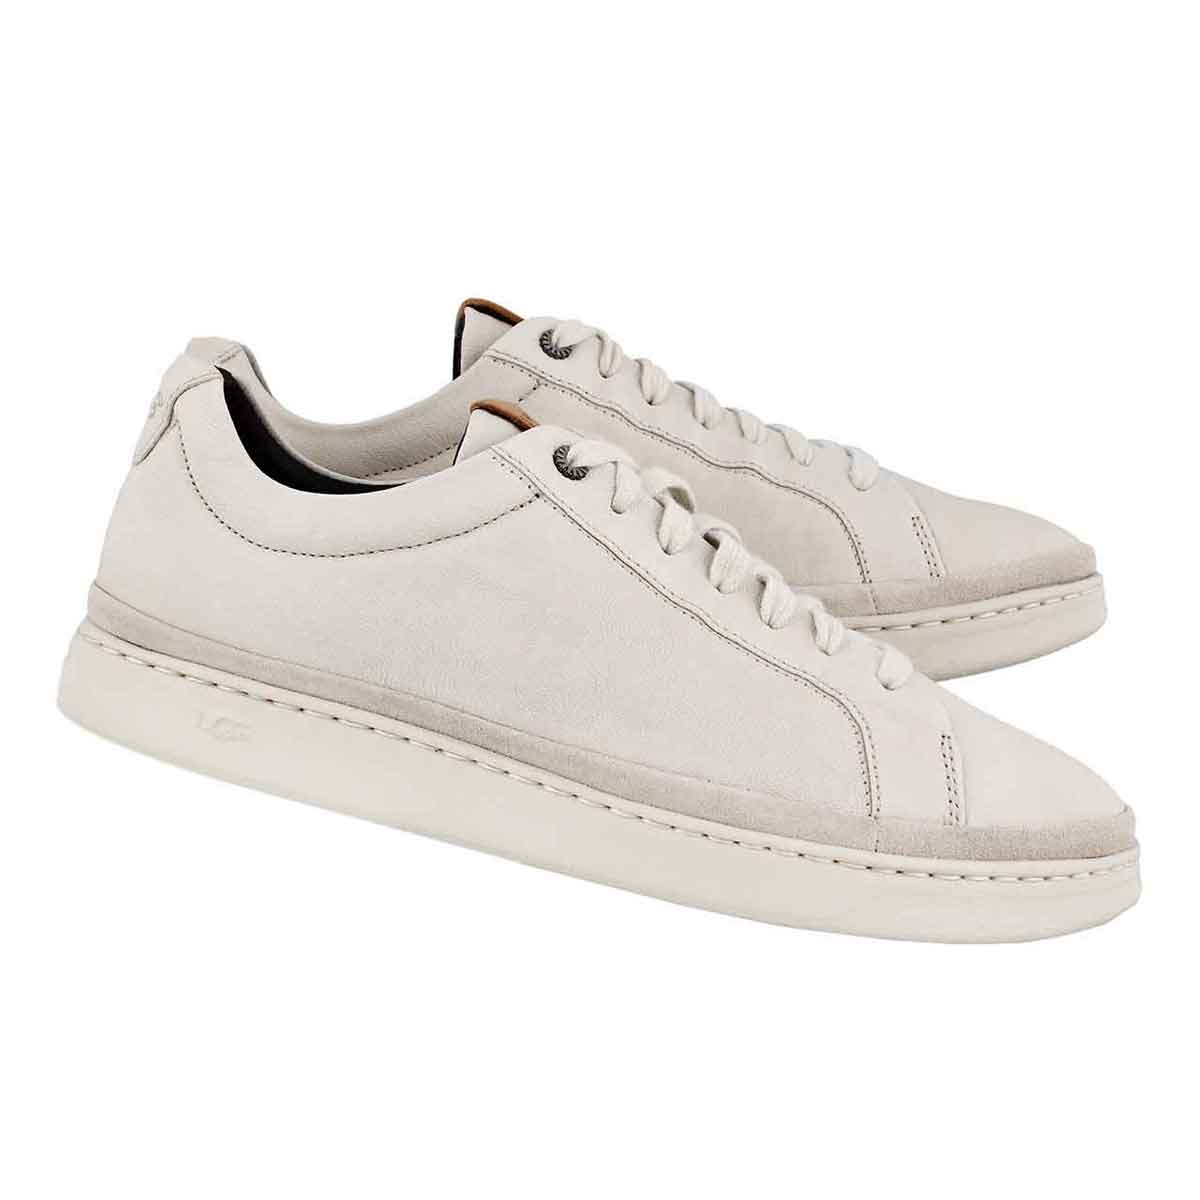 Espad Cali Sneaker Low, parchemin, hom